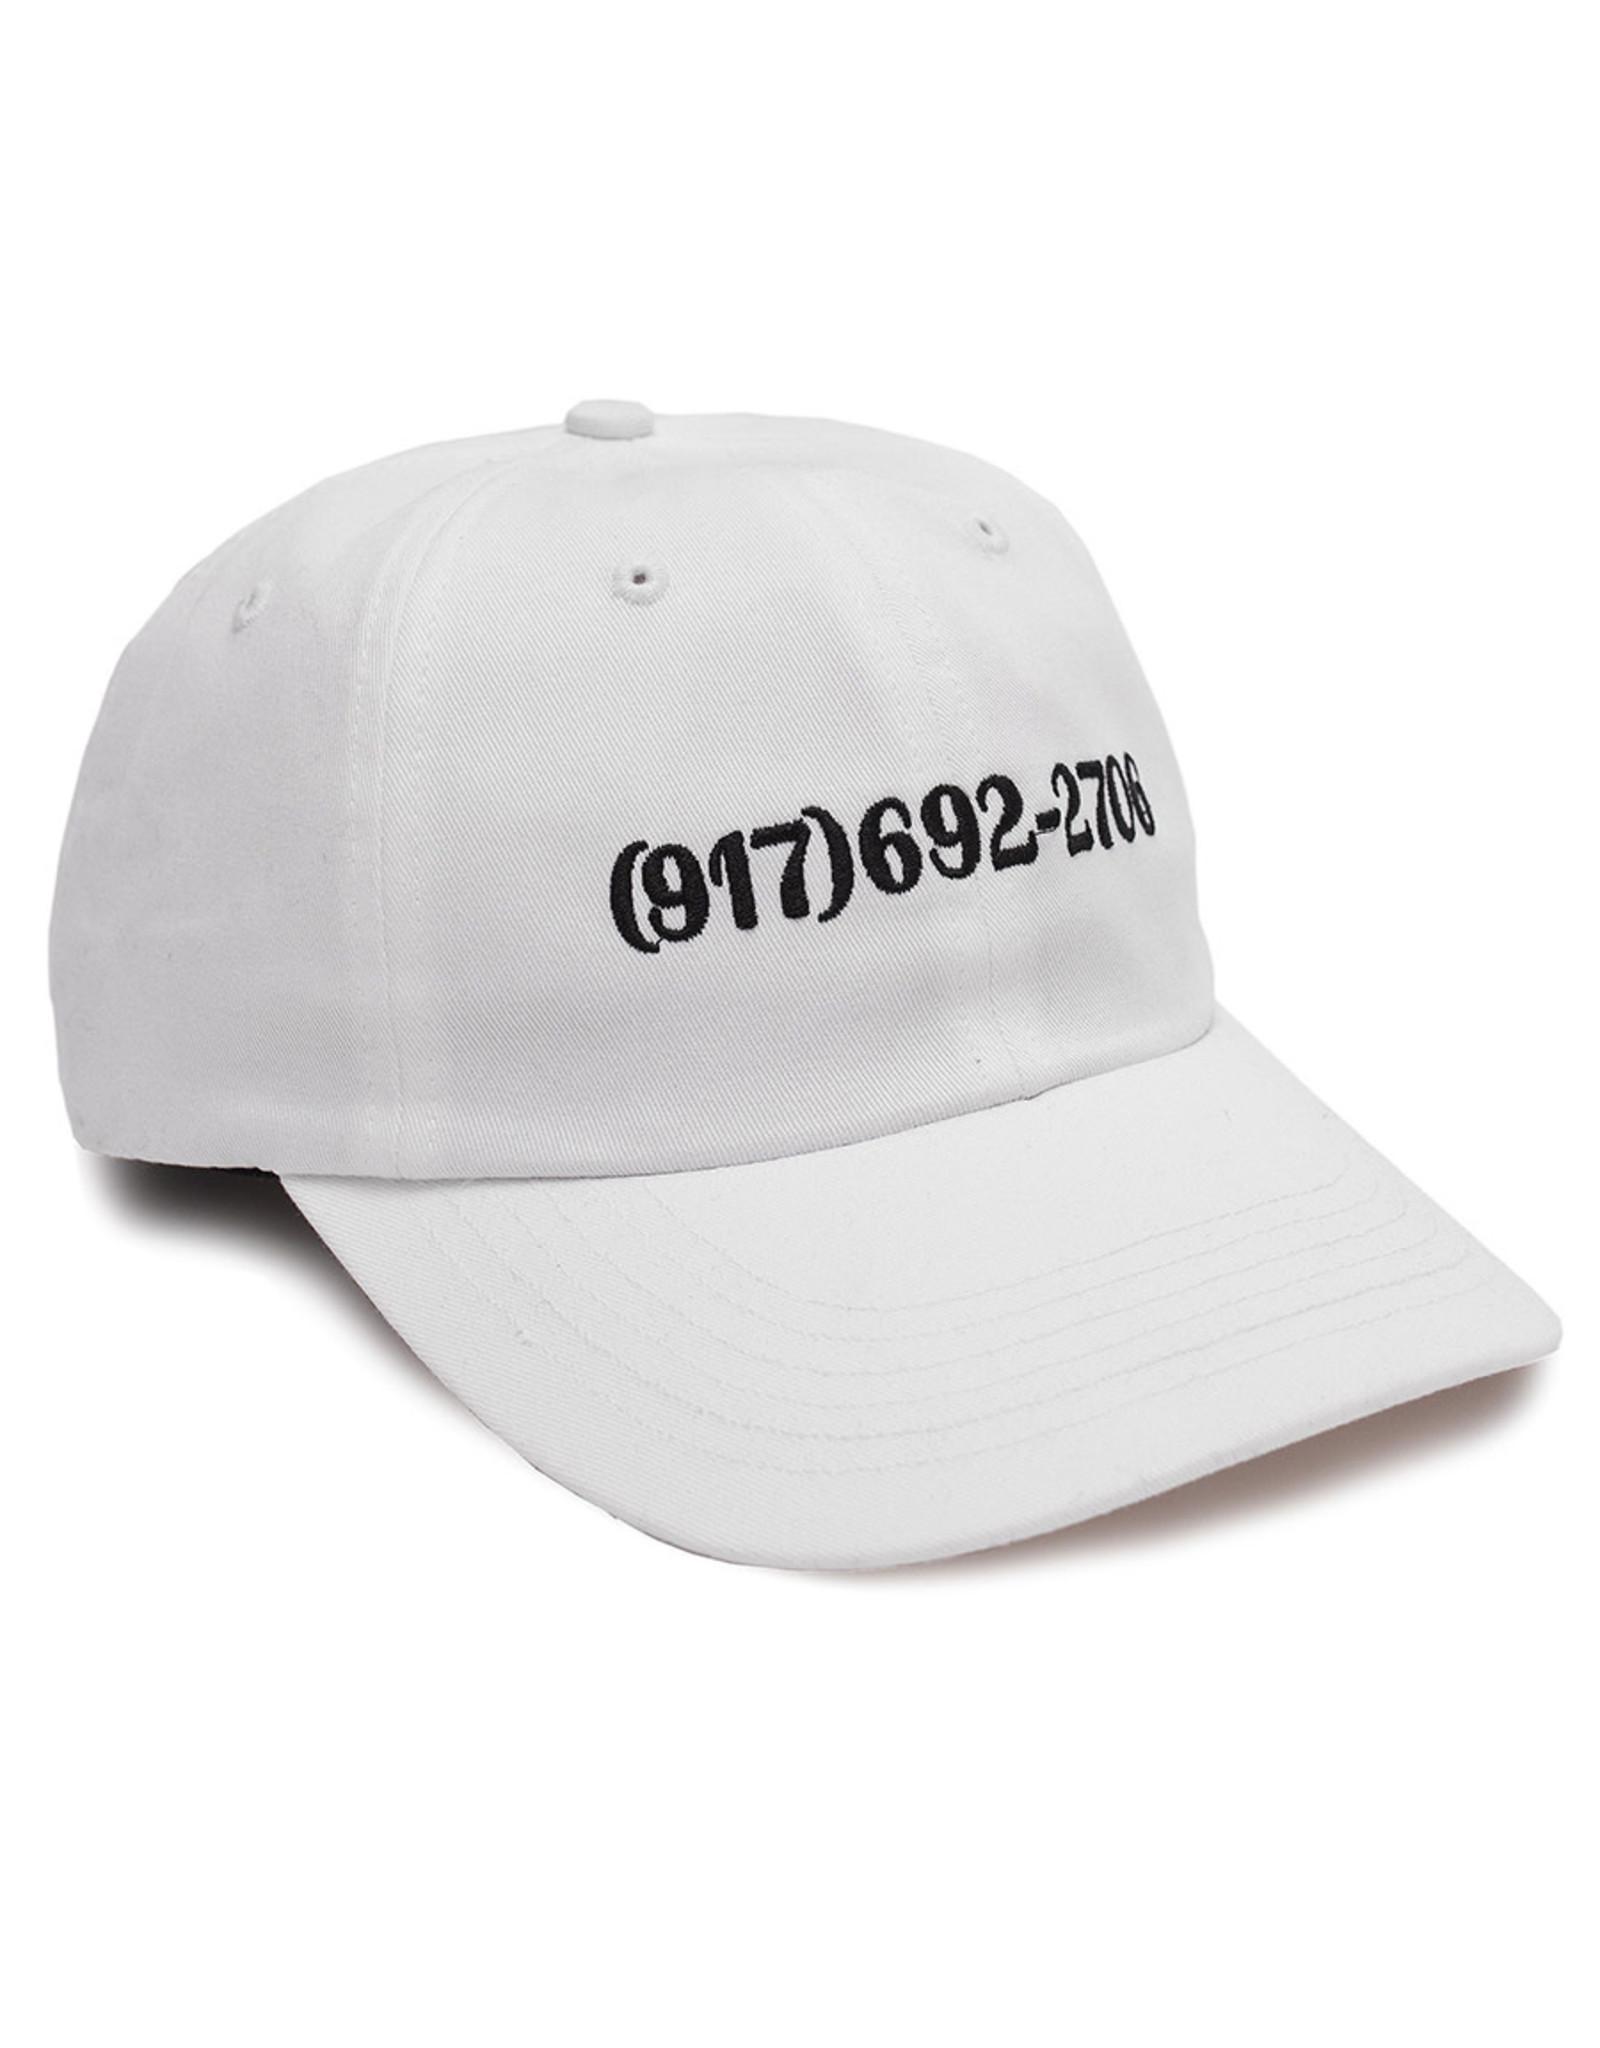 917 917 Hat Dialtone Snapback (White)